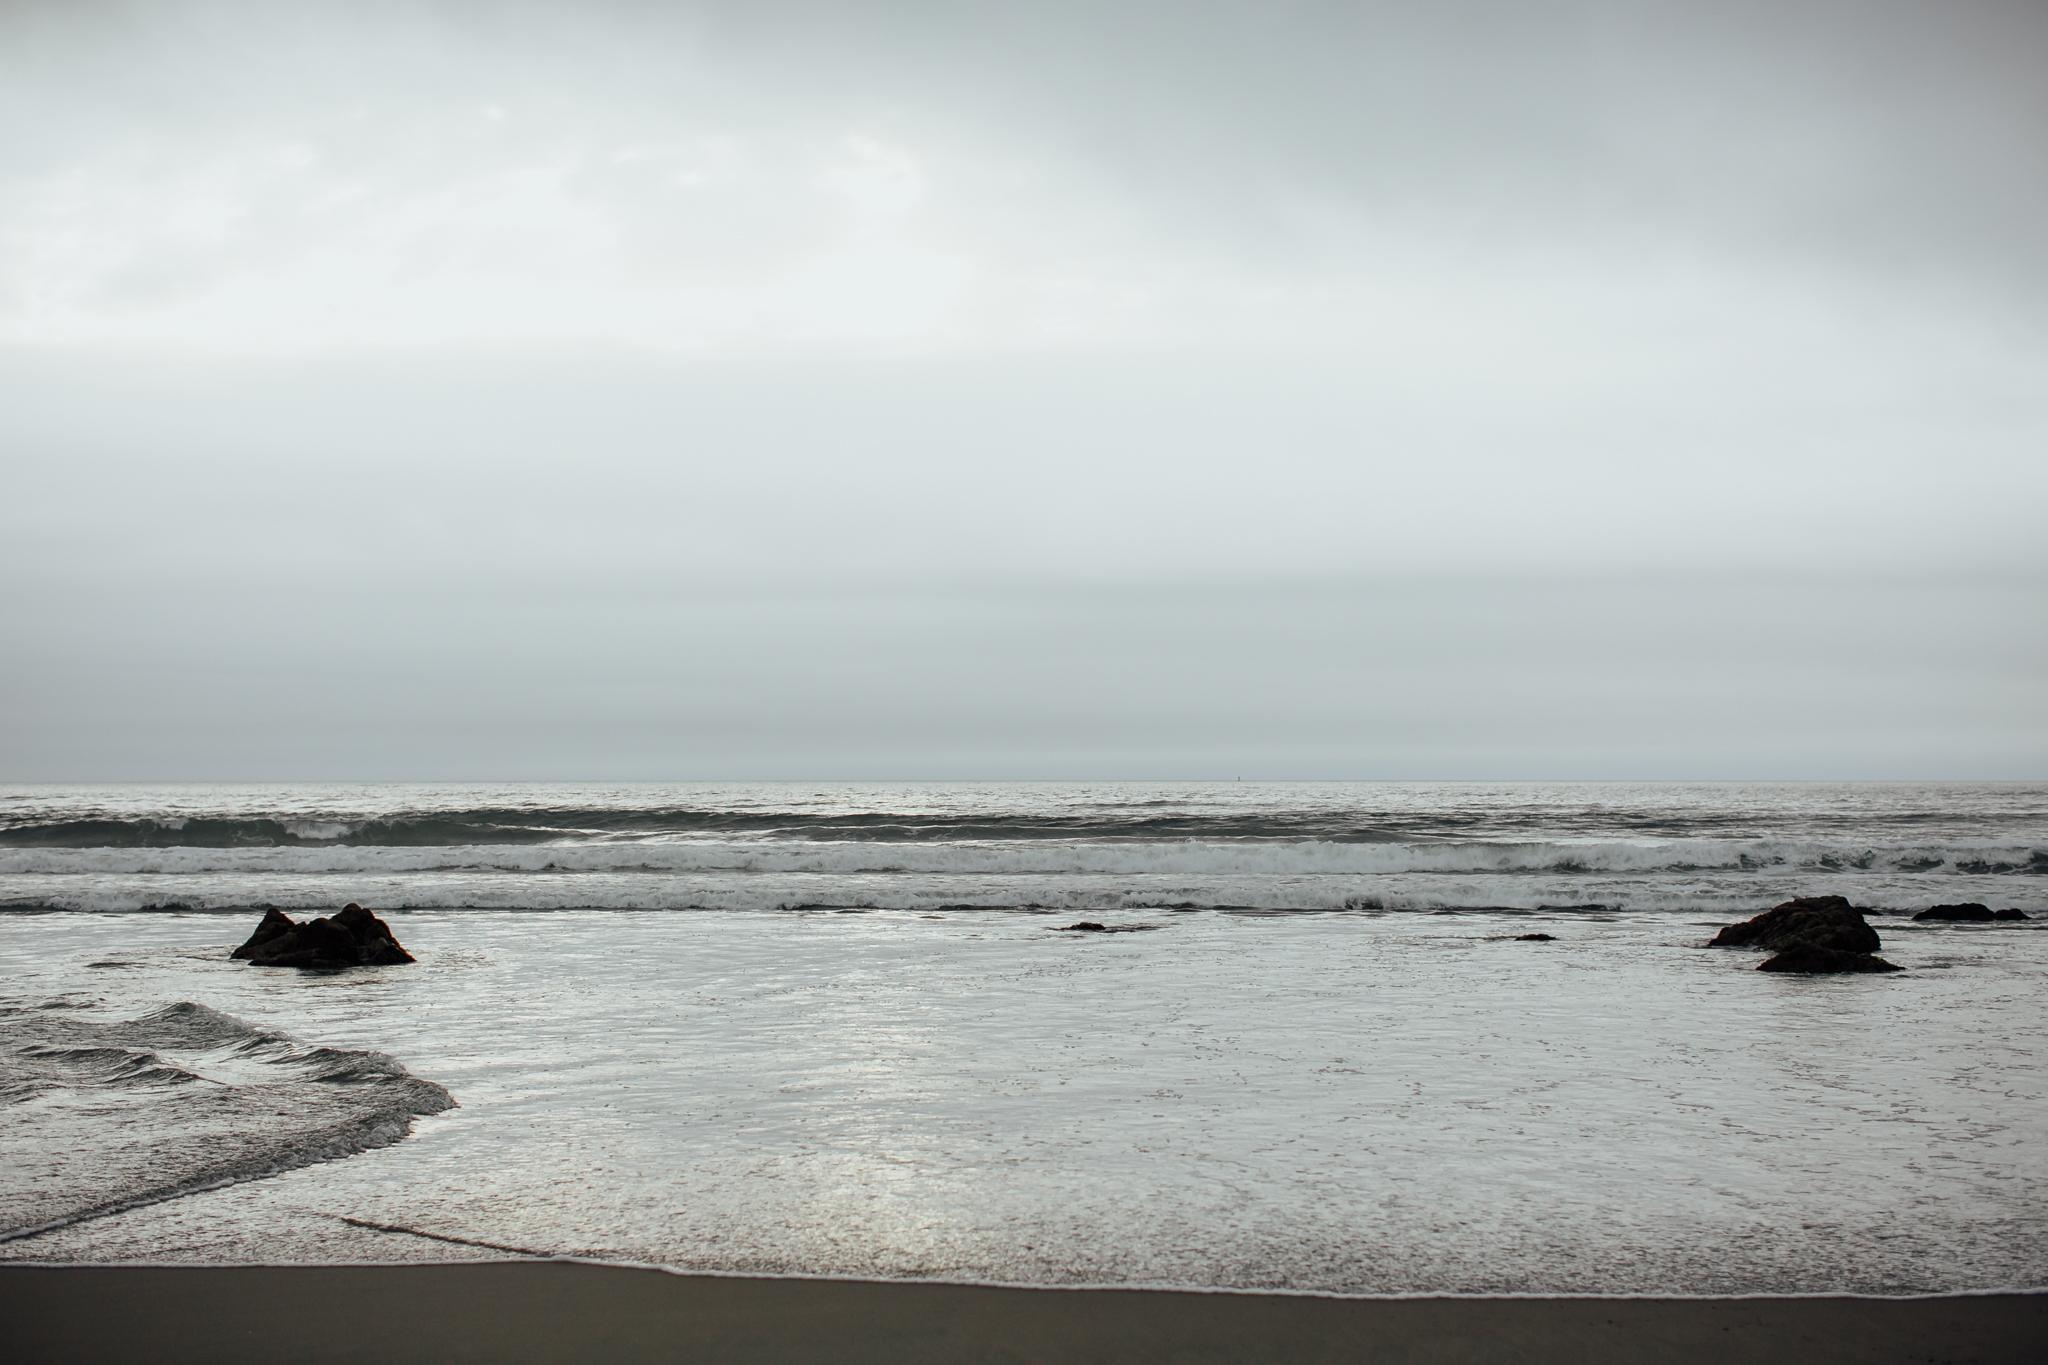 dillonbeach-california-marbleryephotography-037.jpg